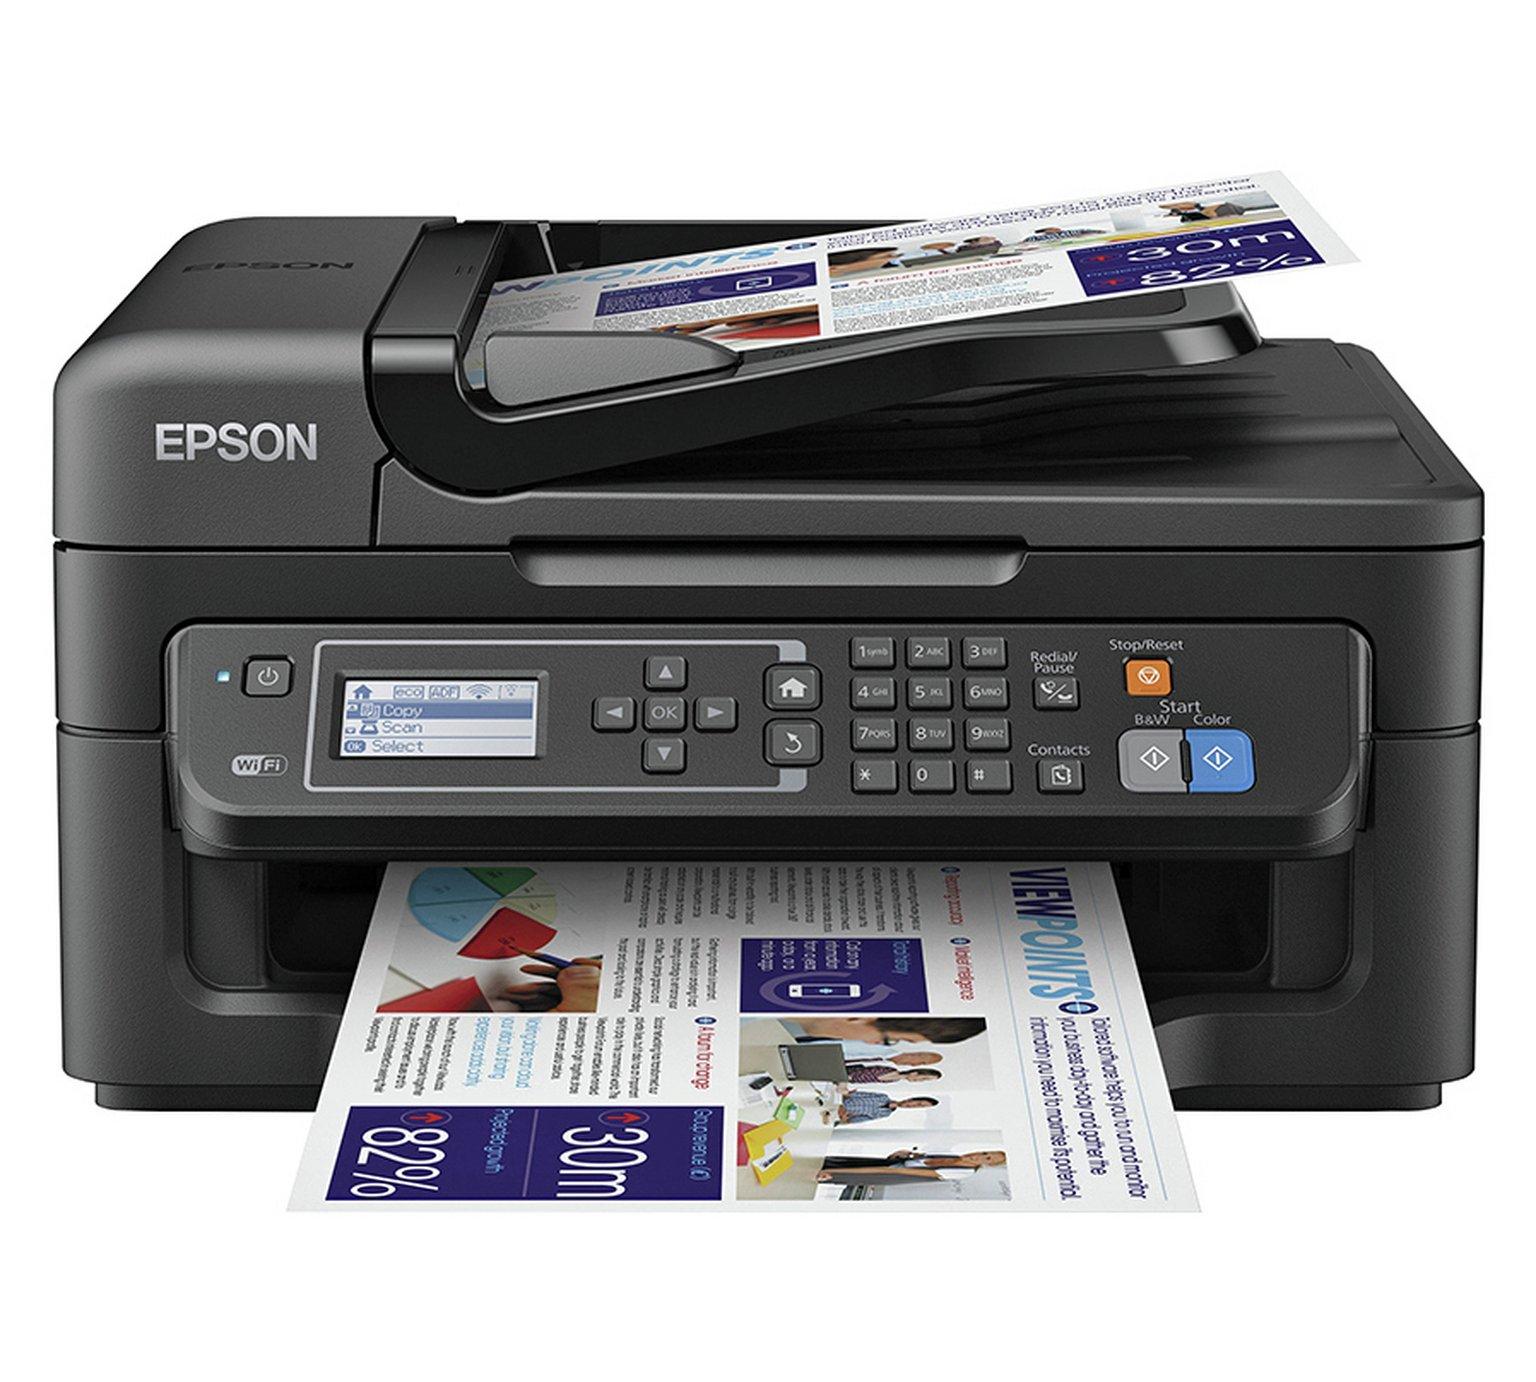 Epson WorkForce WF-2630WF All-in-One Wireless Printer